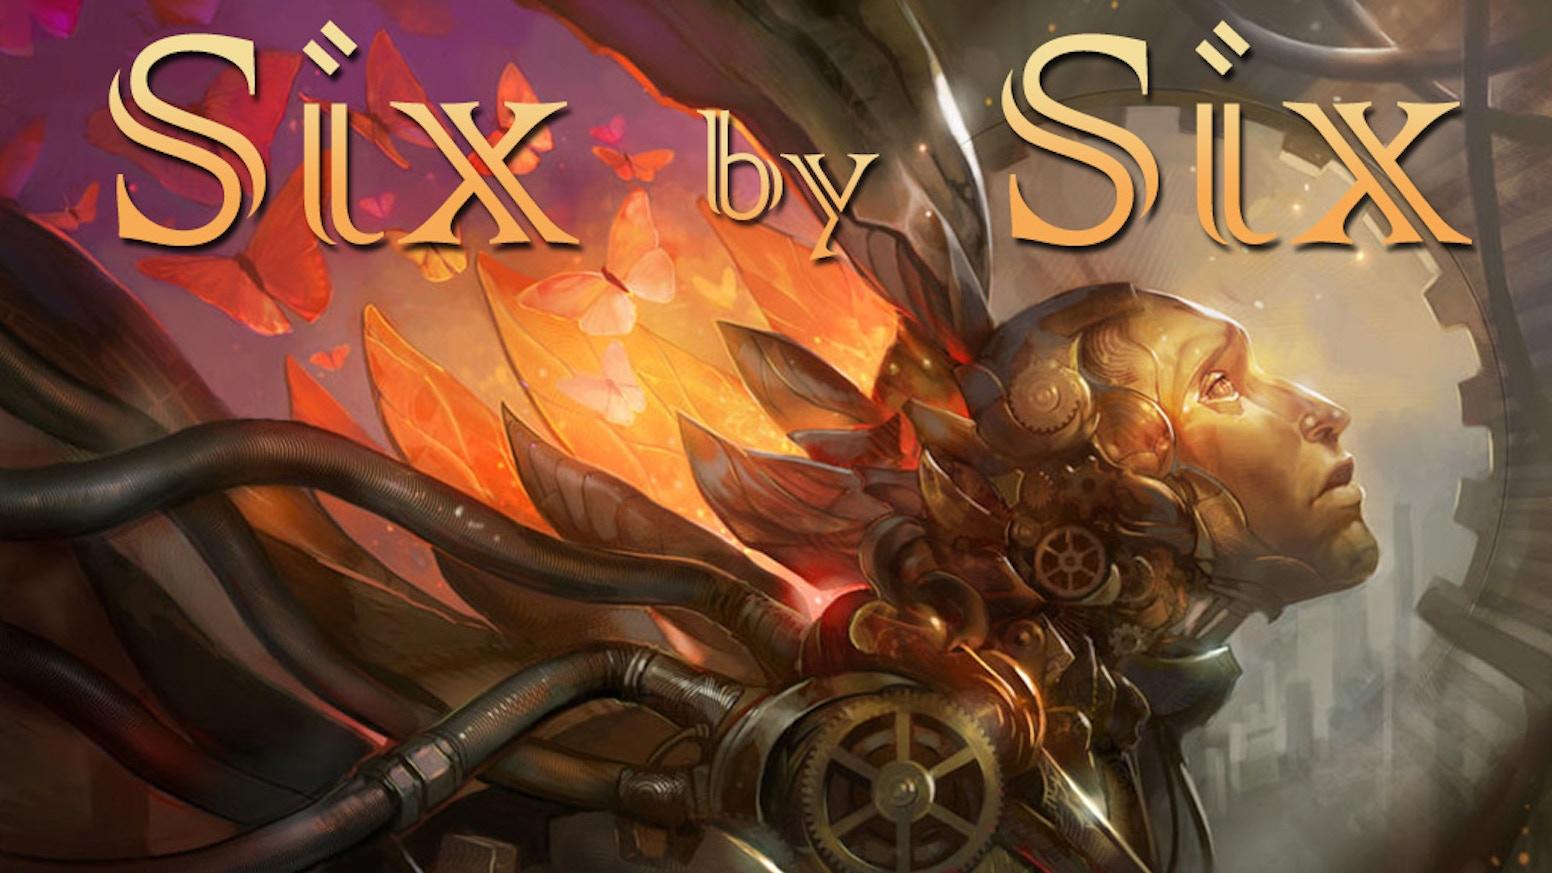 Six by Six by Bradley P  Beaulieu — Kickstarter